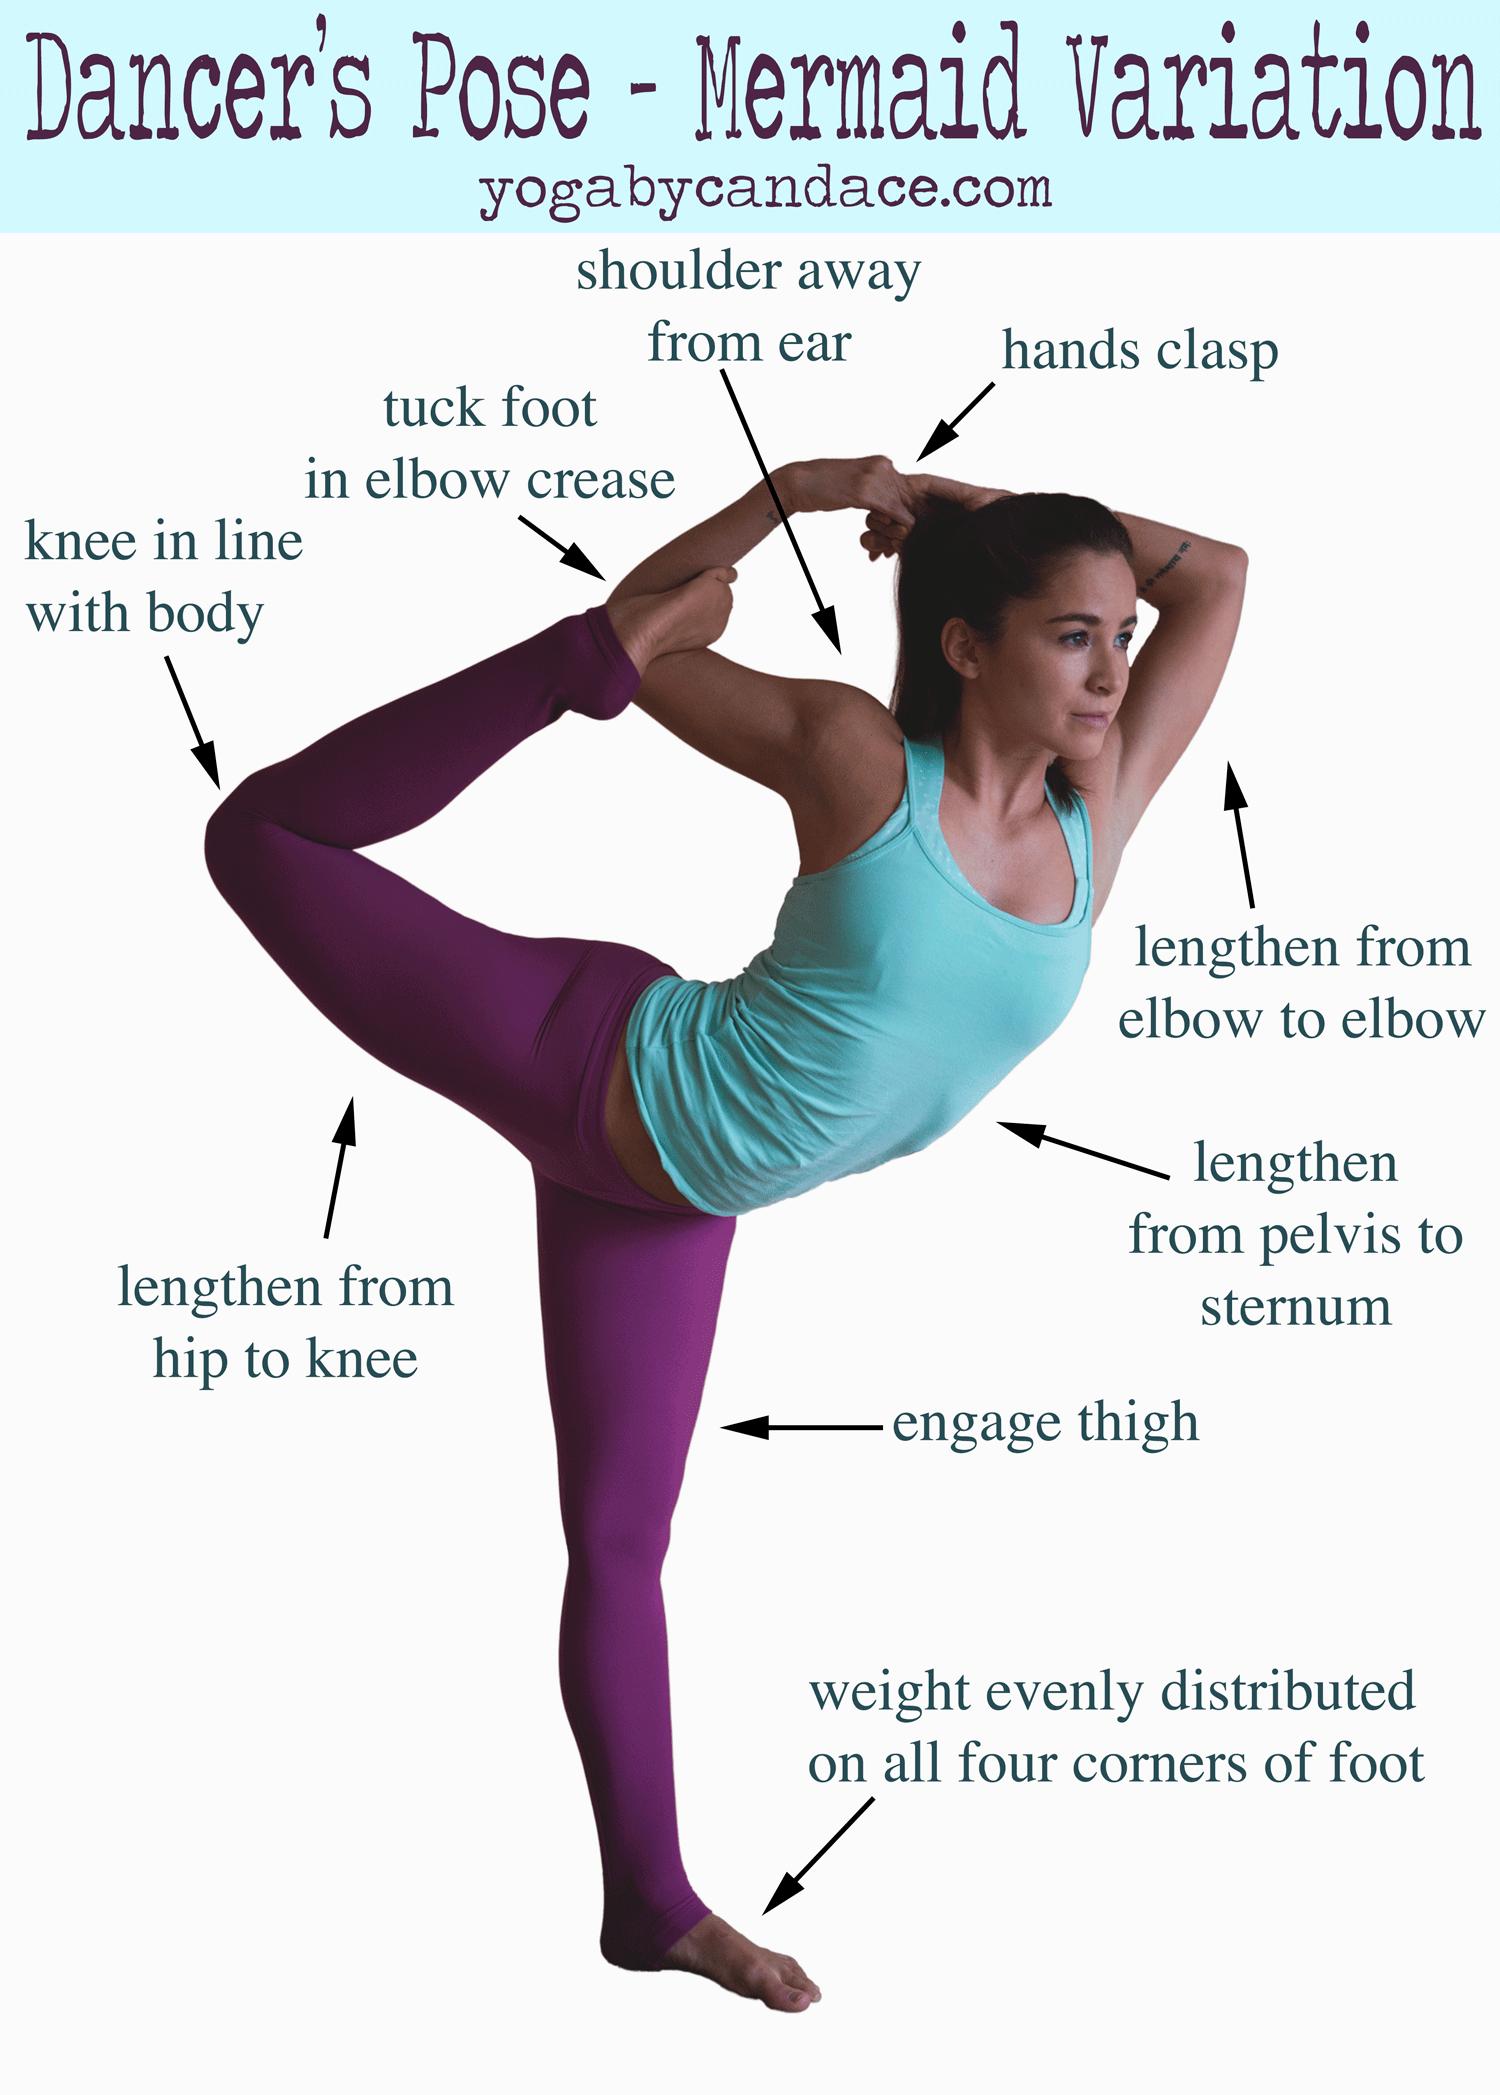 Dancer Pose Yoga Sequence : dancer, sequence, Dancer's, Mermaid, Variation, YOGABYCANDACE